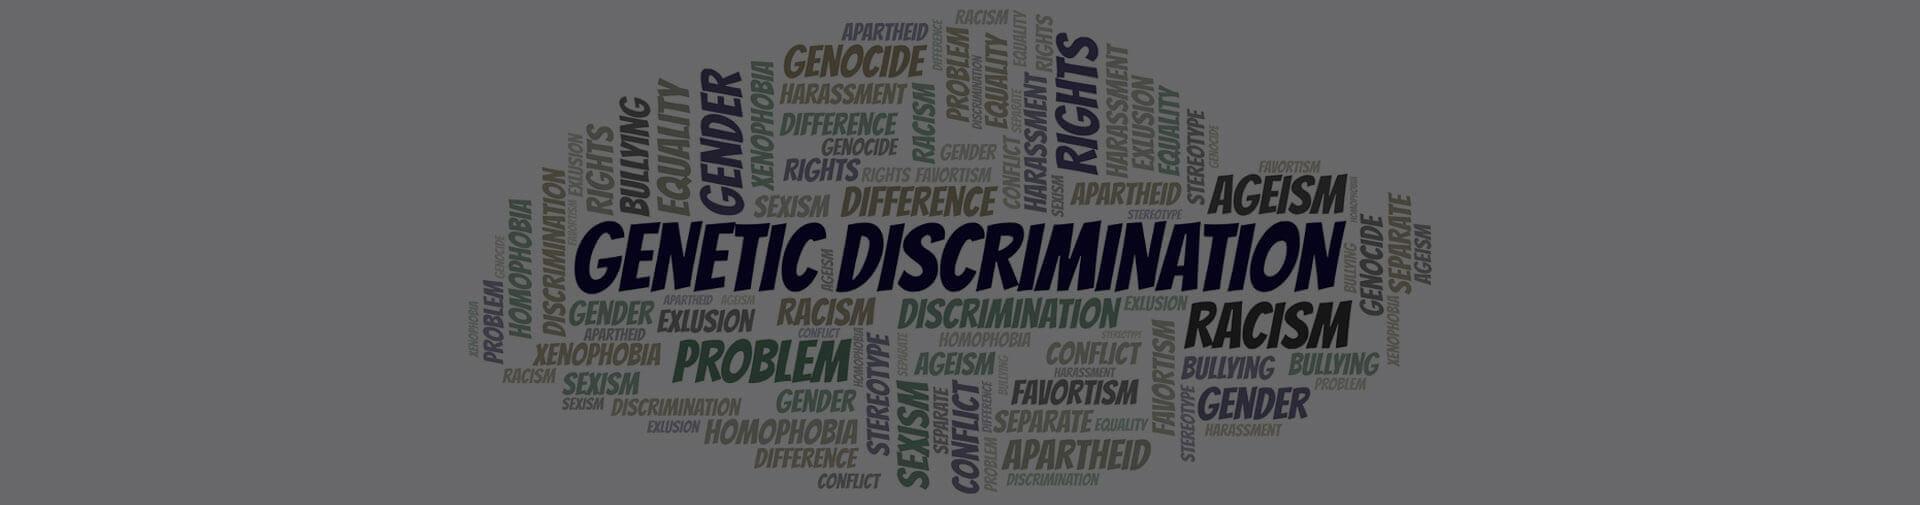 Genetic-Discrimination.jpg